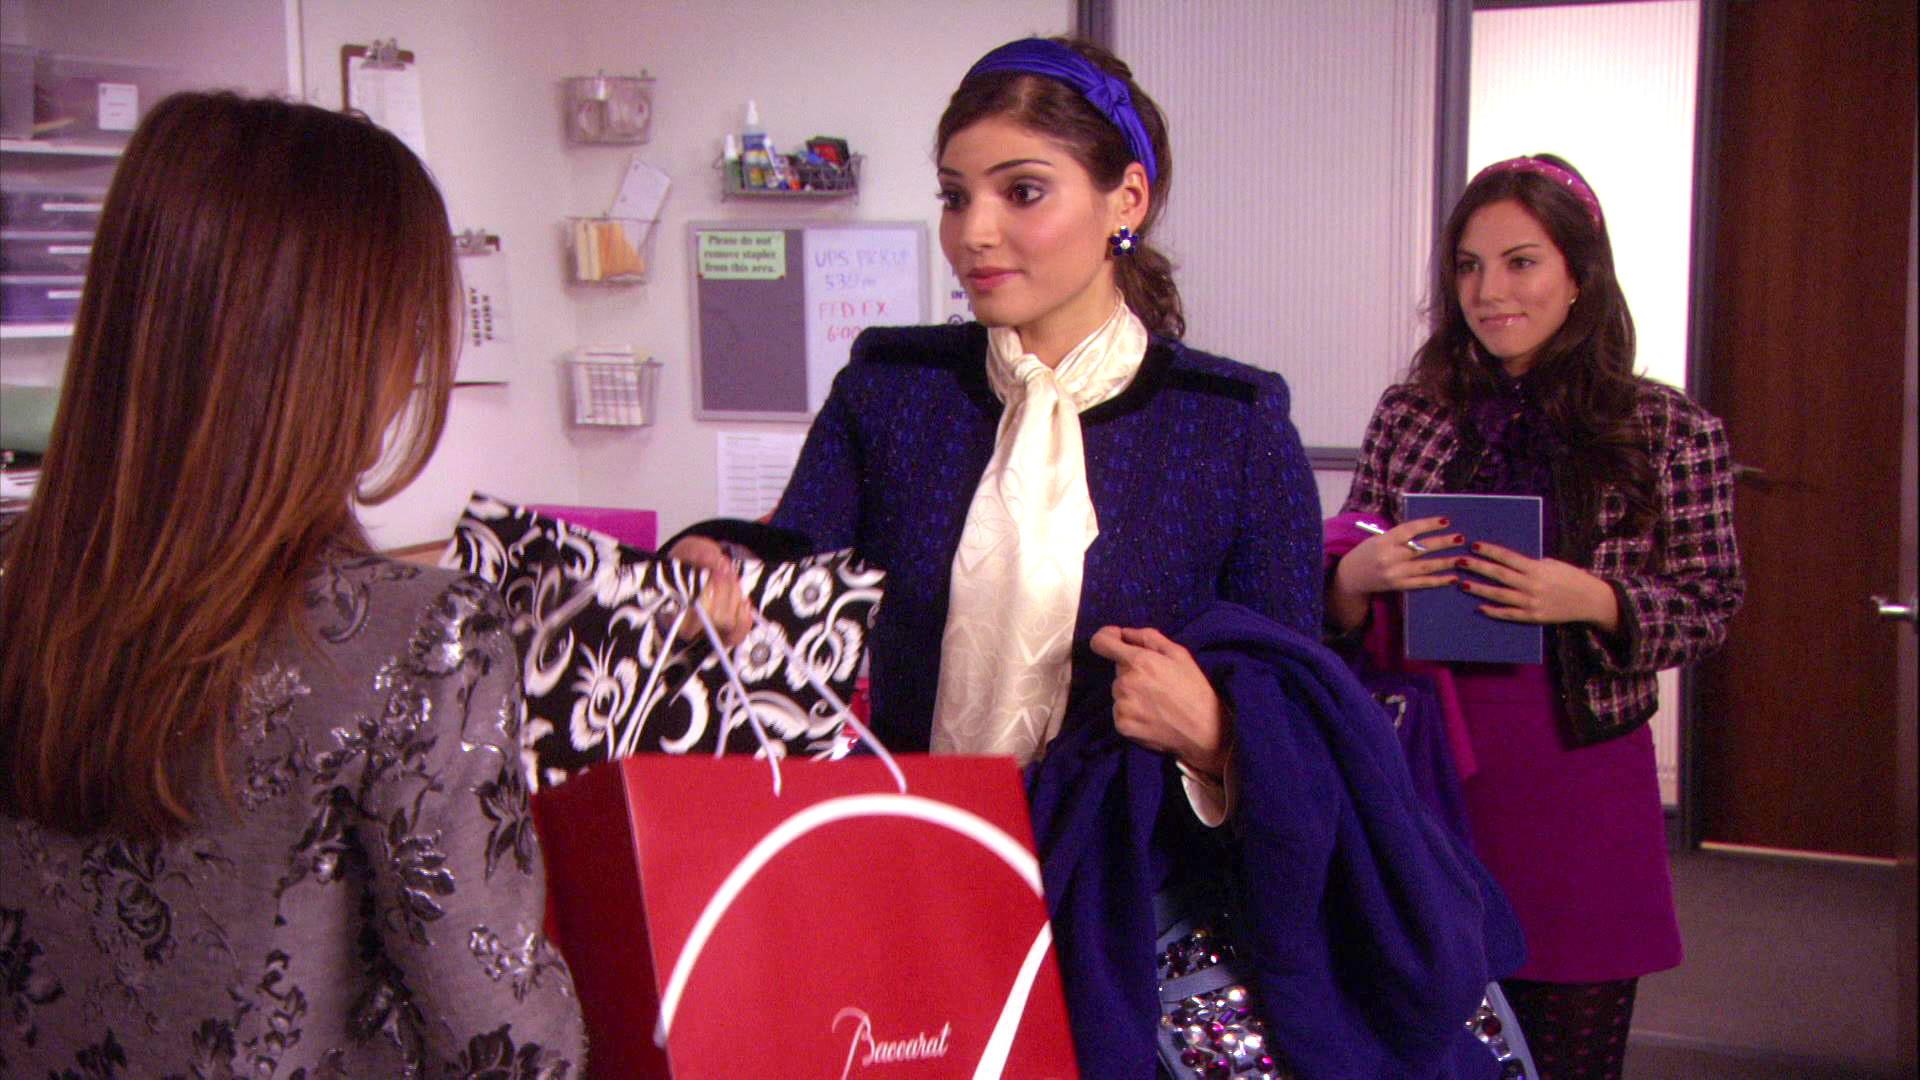 Gossip Girl Staffel 1 Folge 1 Deutsch